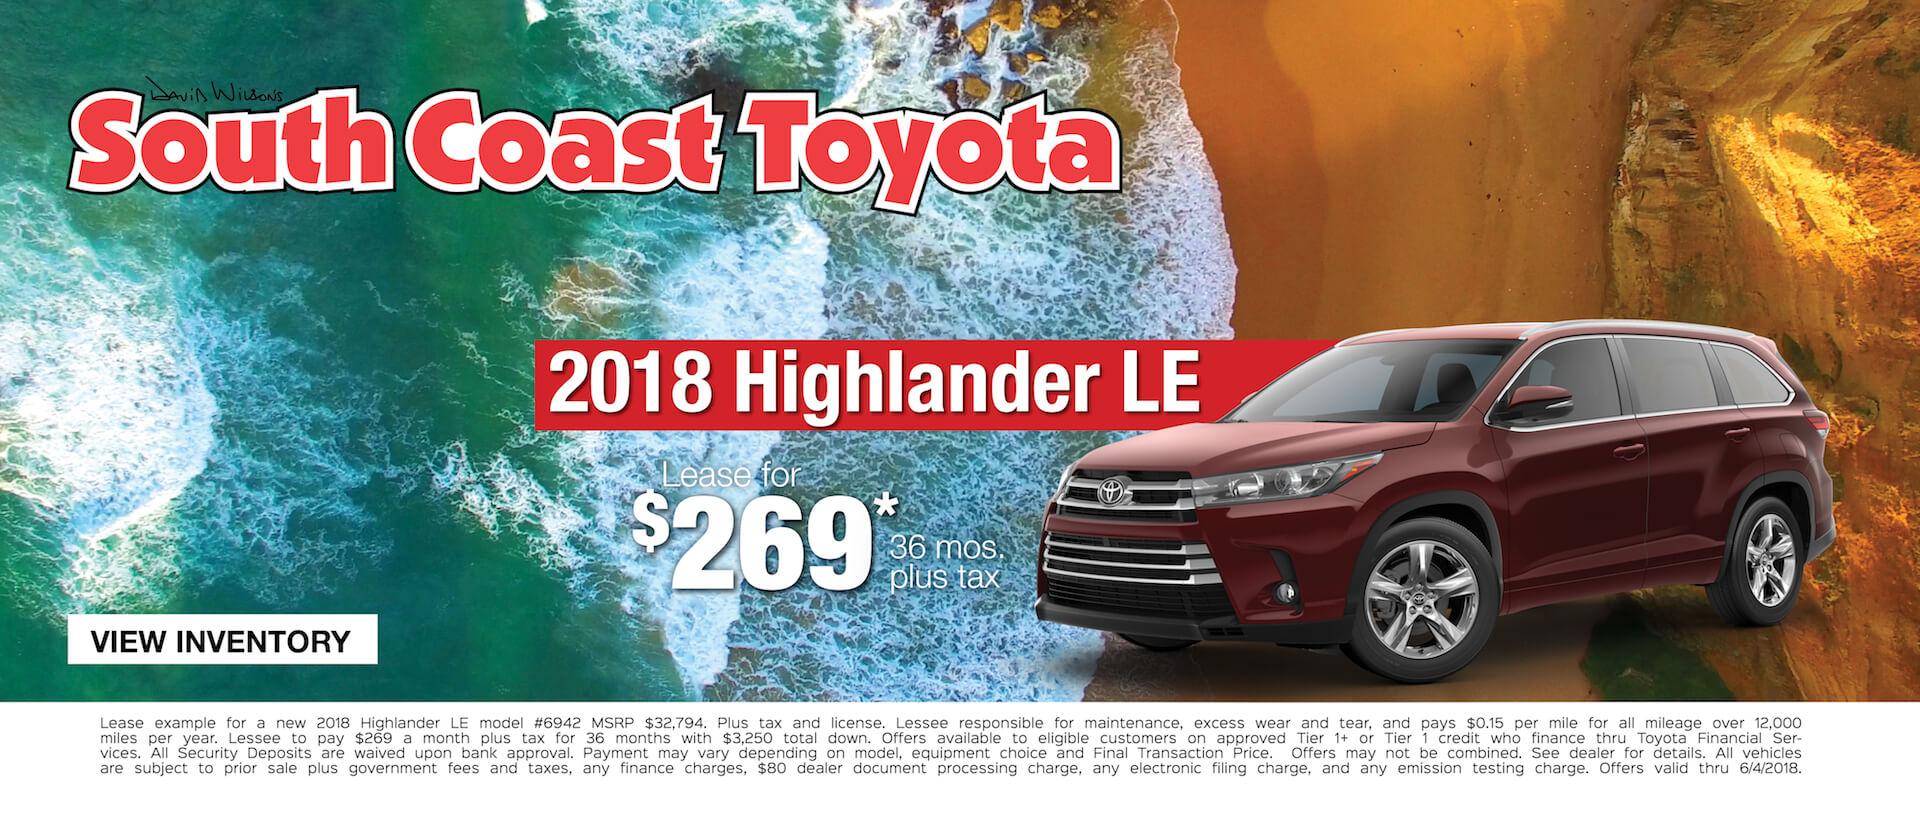 Toyota Highlander $269 Lease